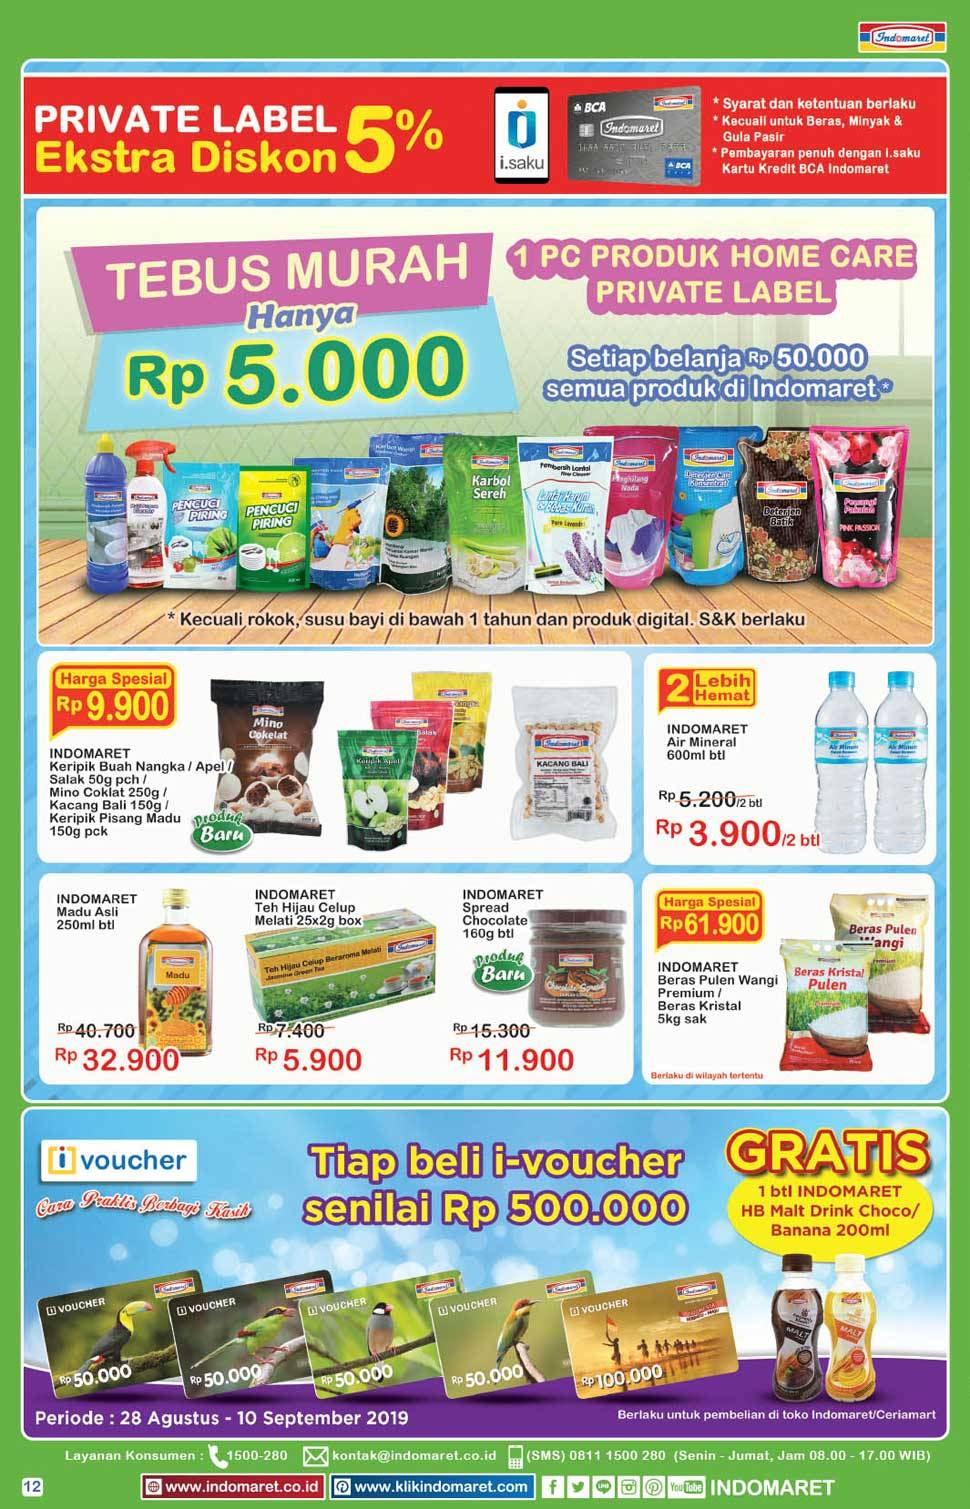 Promo diskon Katalog Promo Indomaret Super Hemat periode 04-10 September 2019